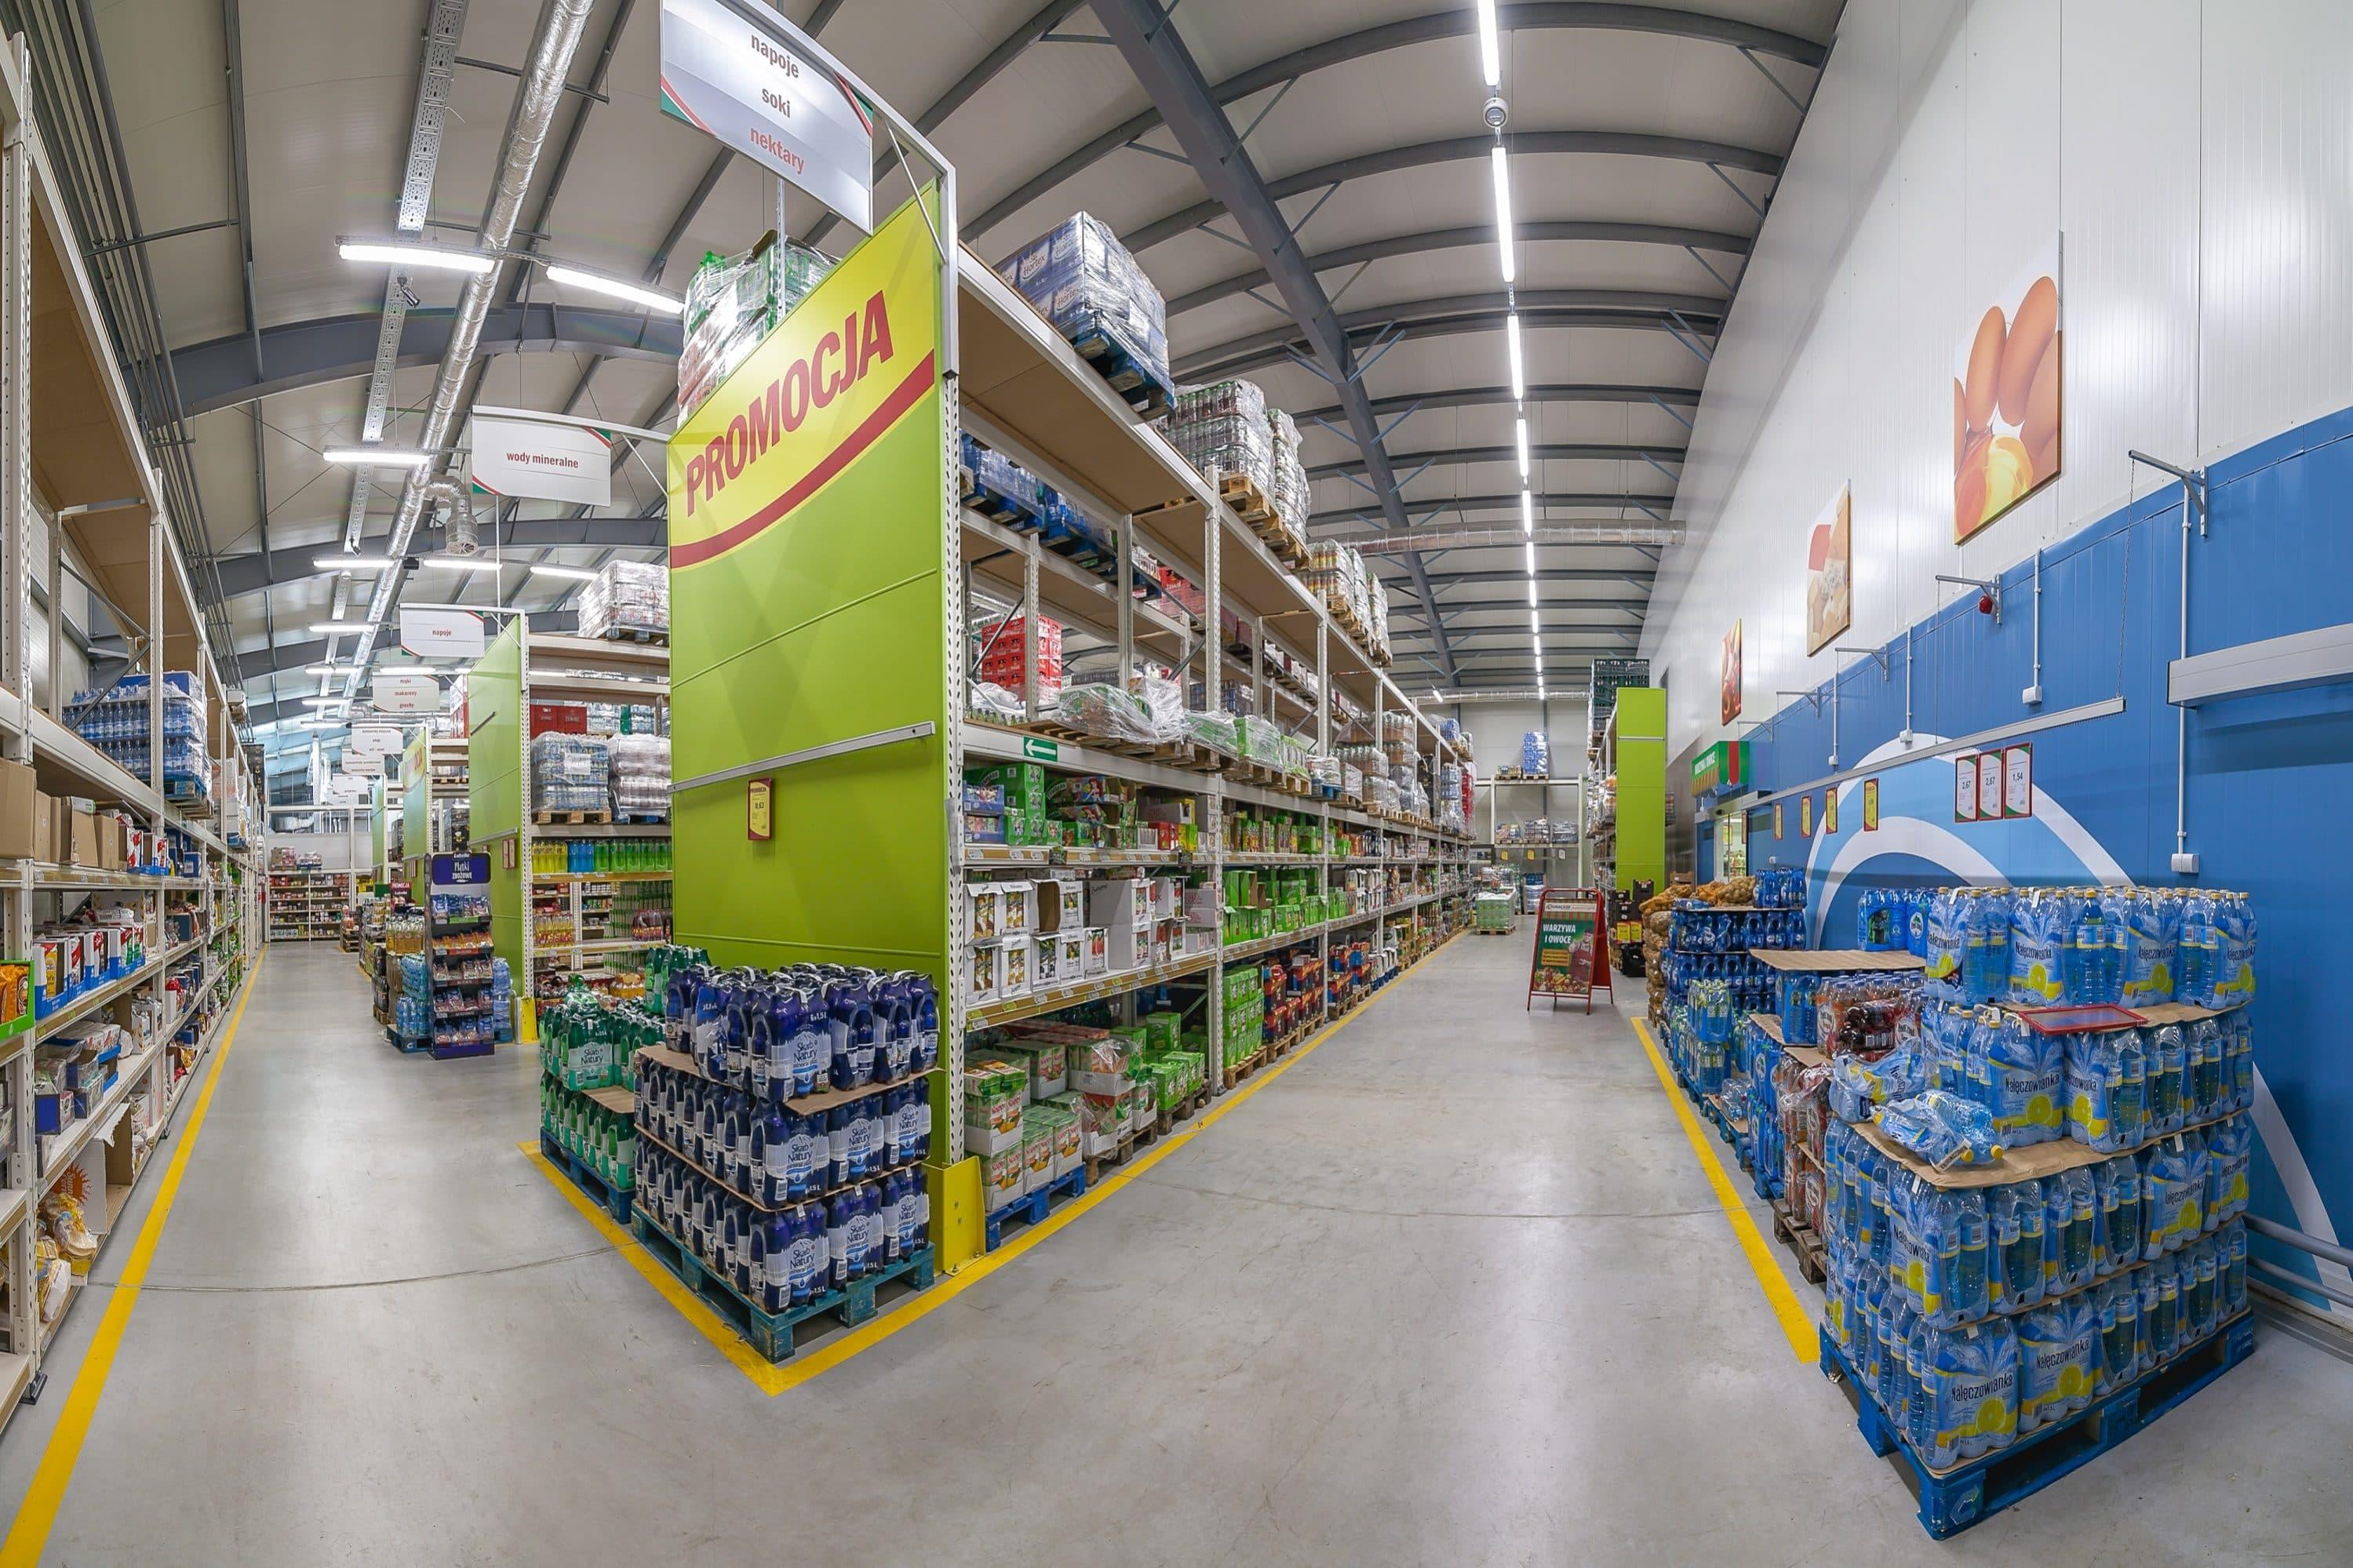 Oprawy Industrial w sklepie Eurocash - Luxon LED